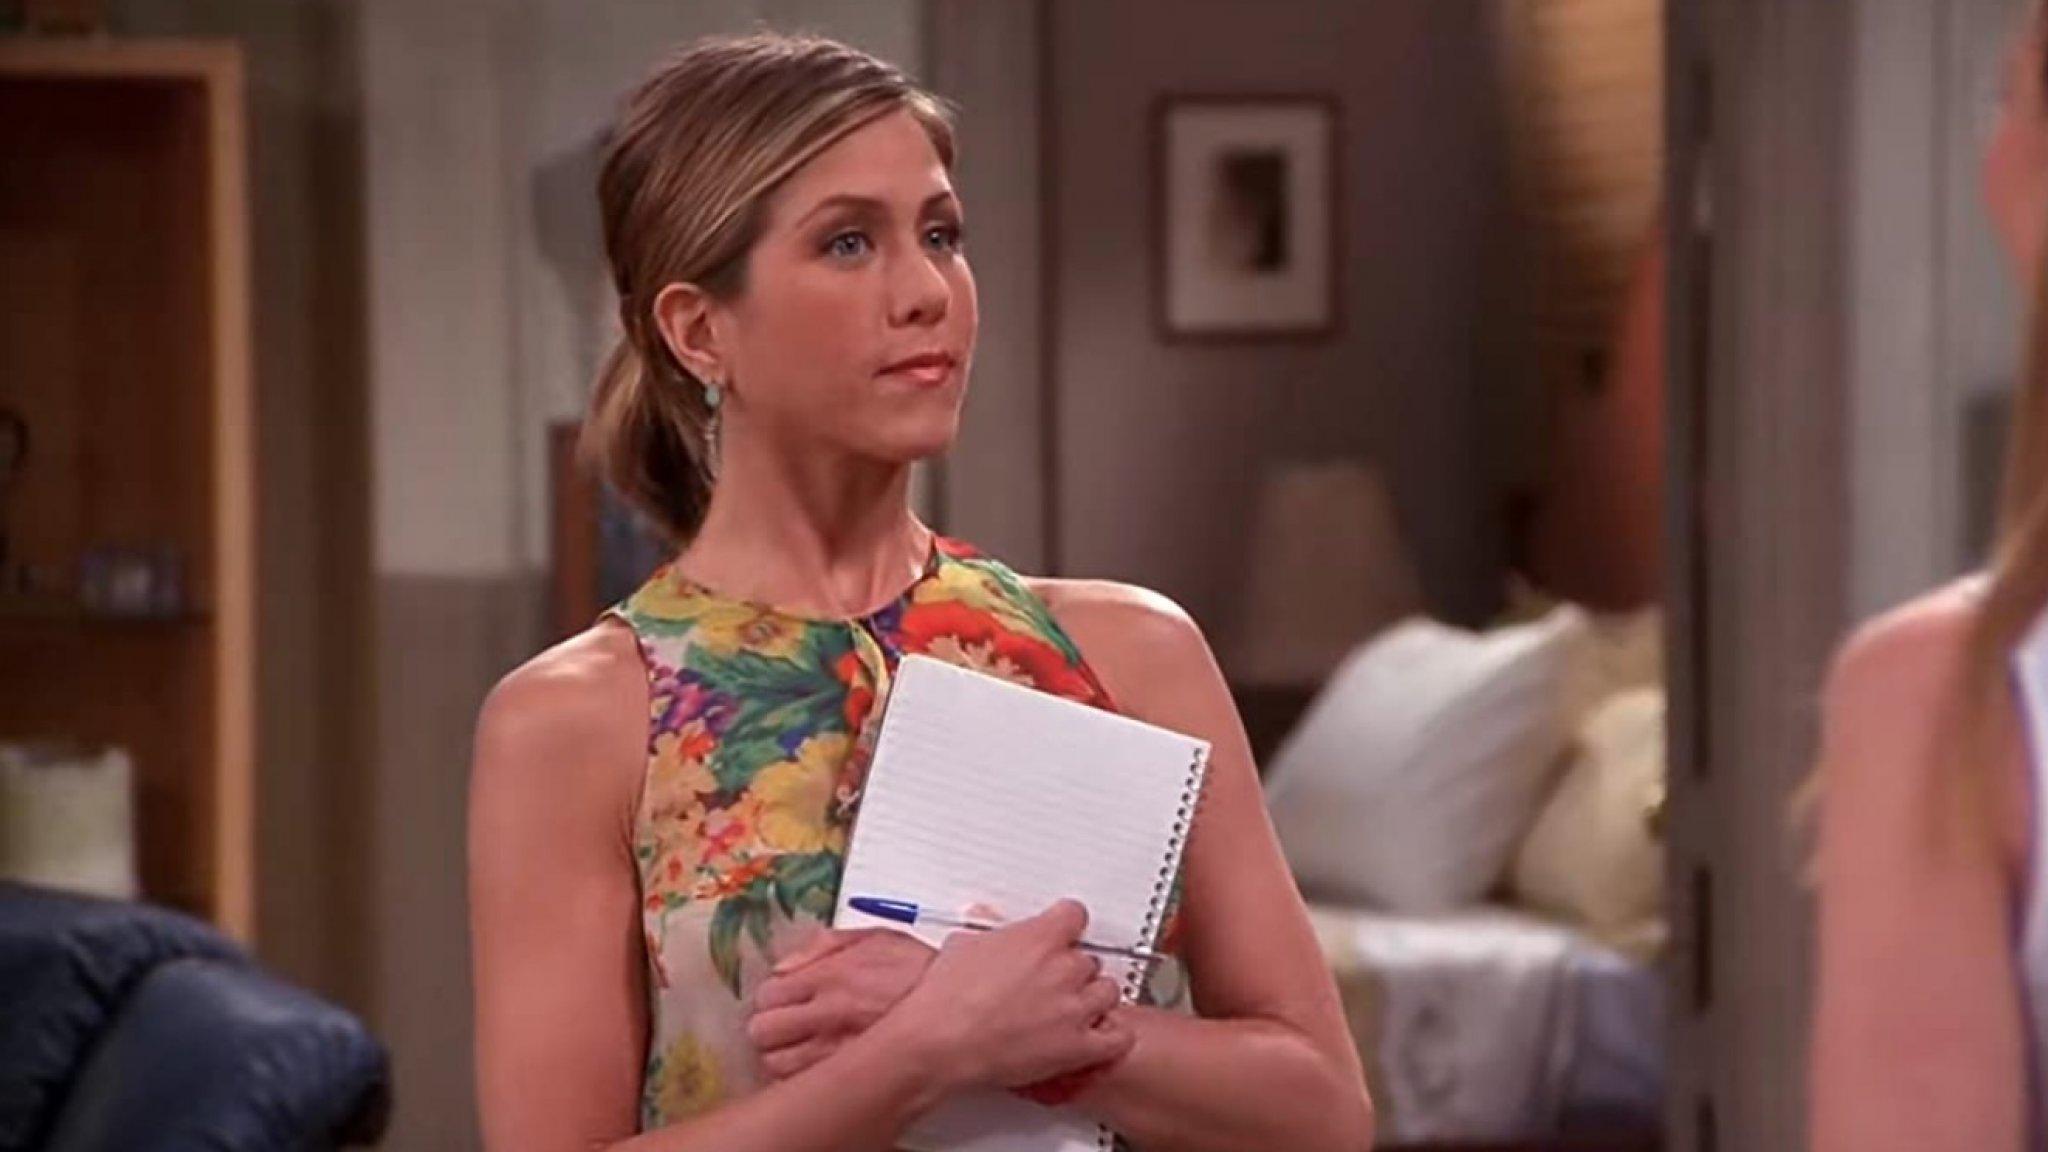 Tic Jennifer Aniston in Friends gaat jaren later viral - RTL Nieuws